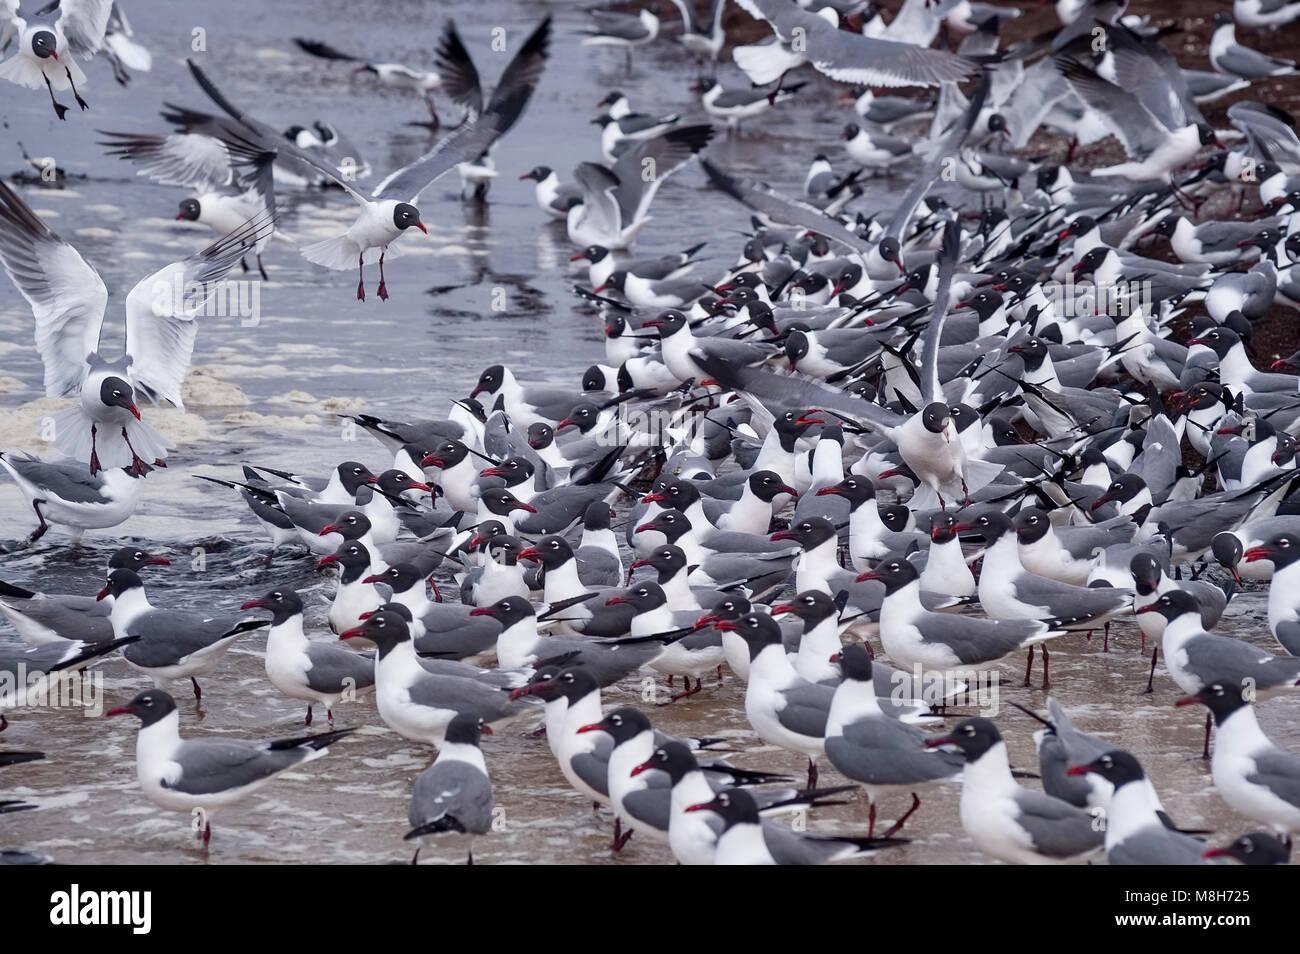 Laughing Gull, Leucophaeus atricilla, Reeds Beach, Delaware Bay, New Jersey, USA - Stock Image